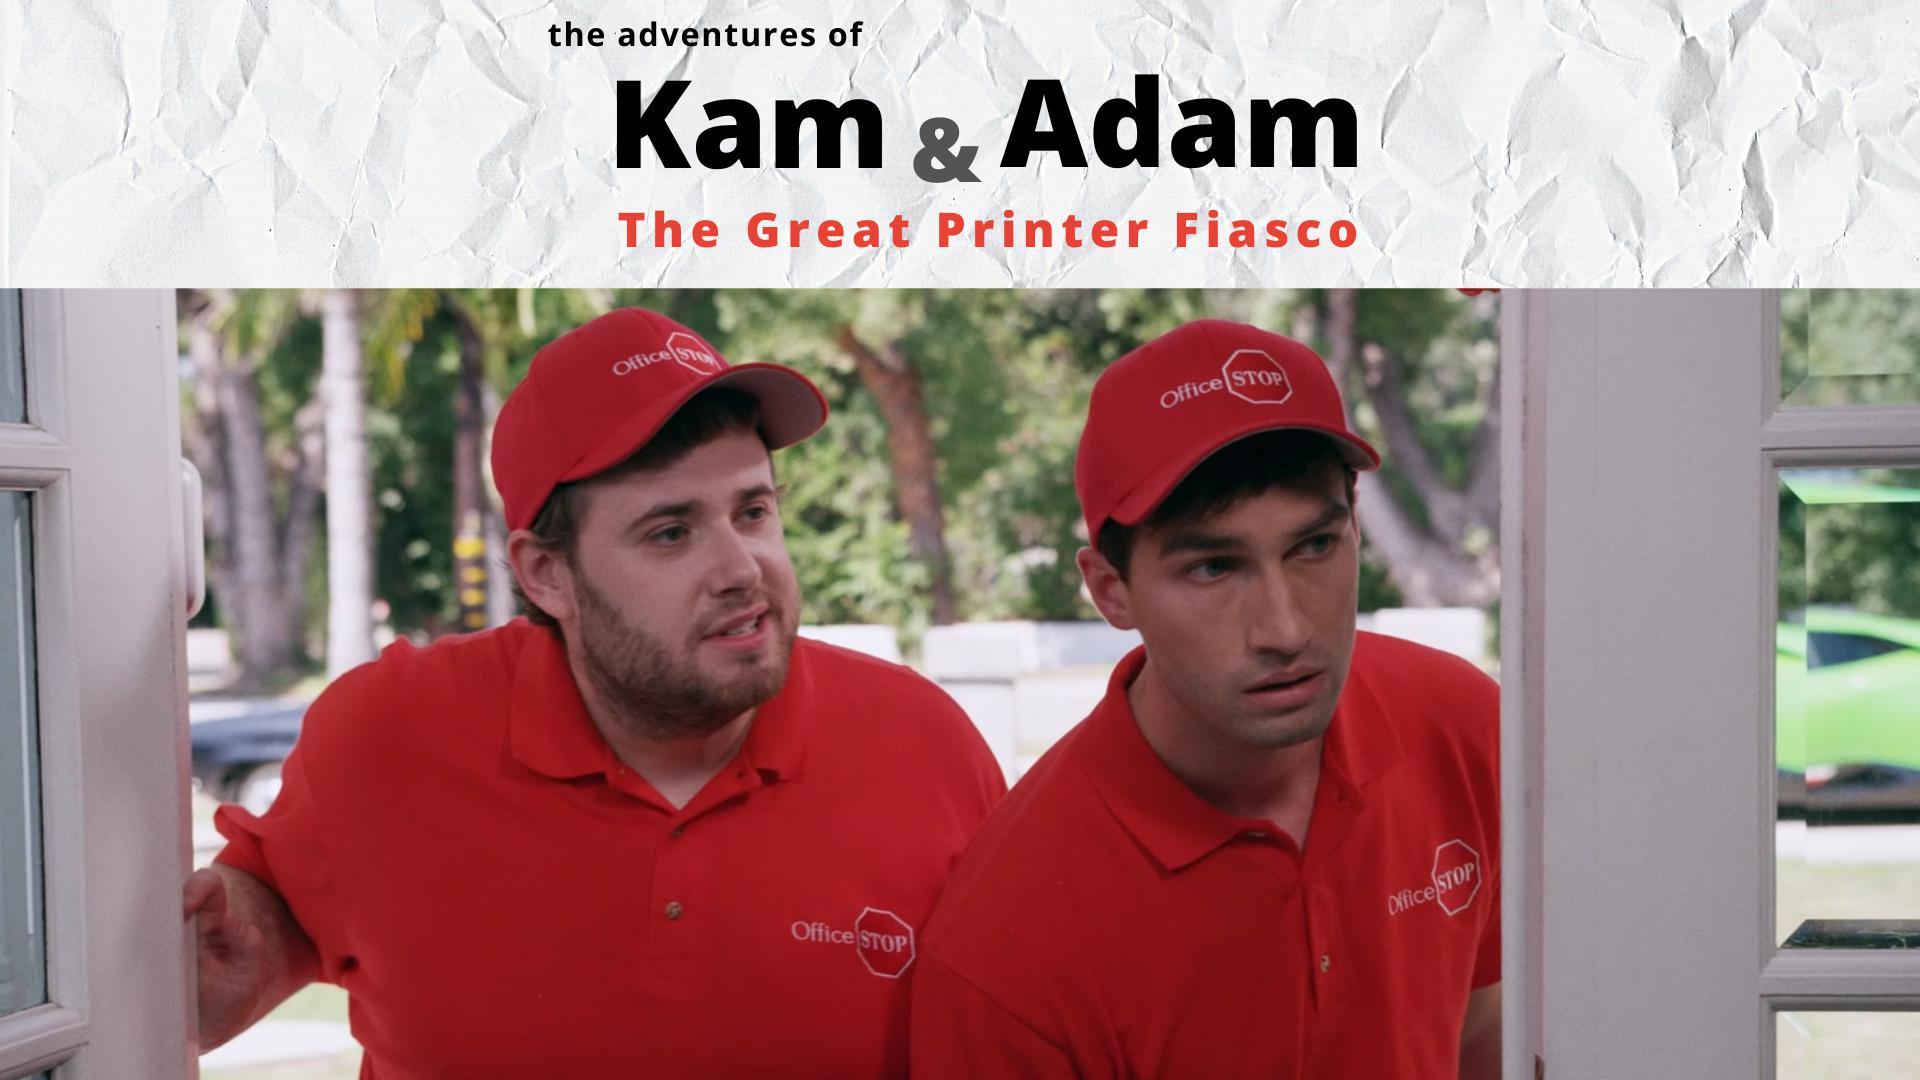 The Adventures of Kam & Adam: The Great Printer Fiasco